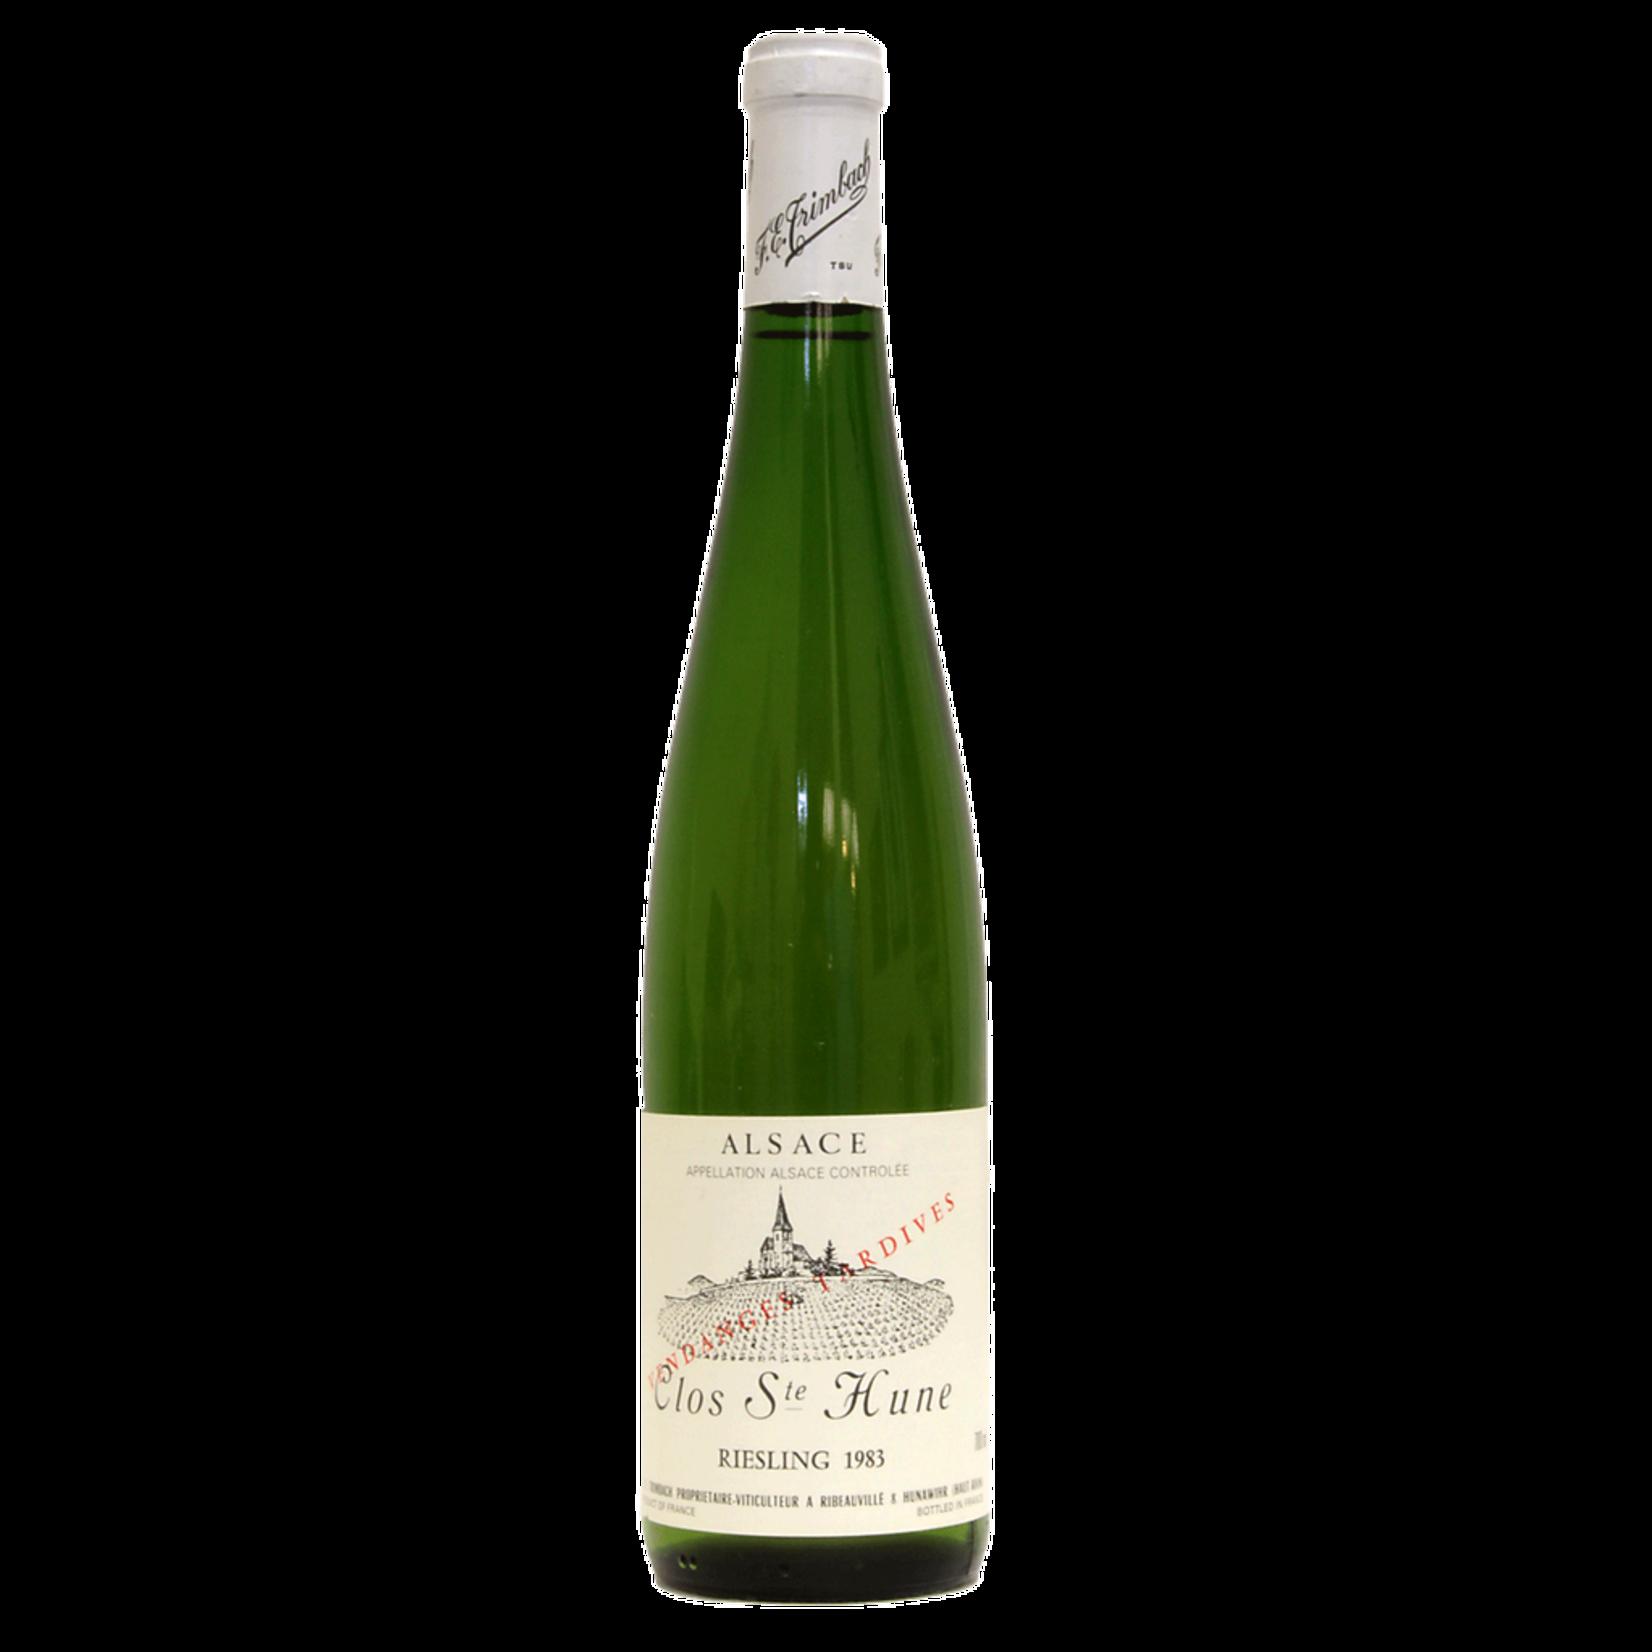 Wine Trimbach Riesling Clos Sainte Hune Vendanges Tardives 1997 375ml